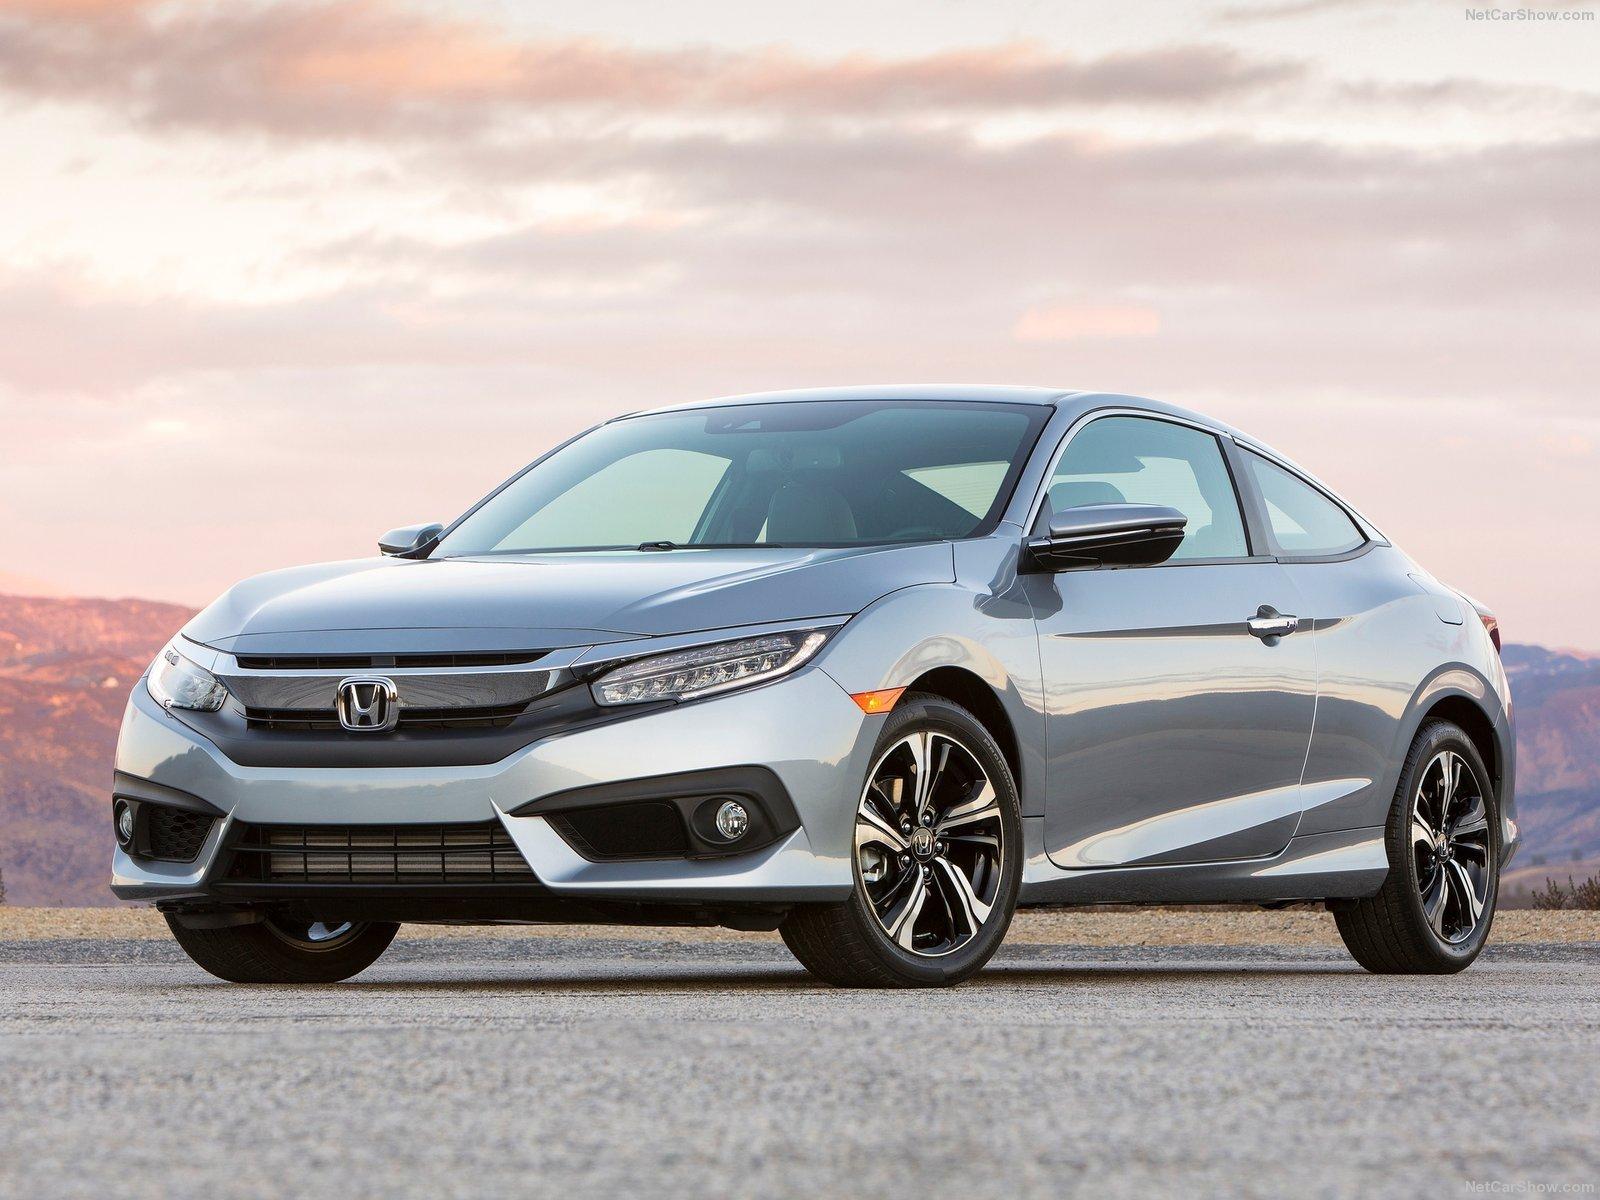 2016 Honda Civic Cars Silver Coupe Wallpaper 1600x1200 897755